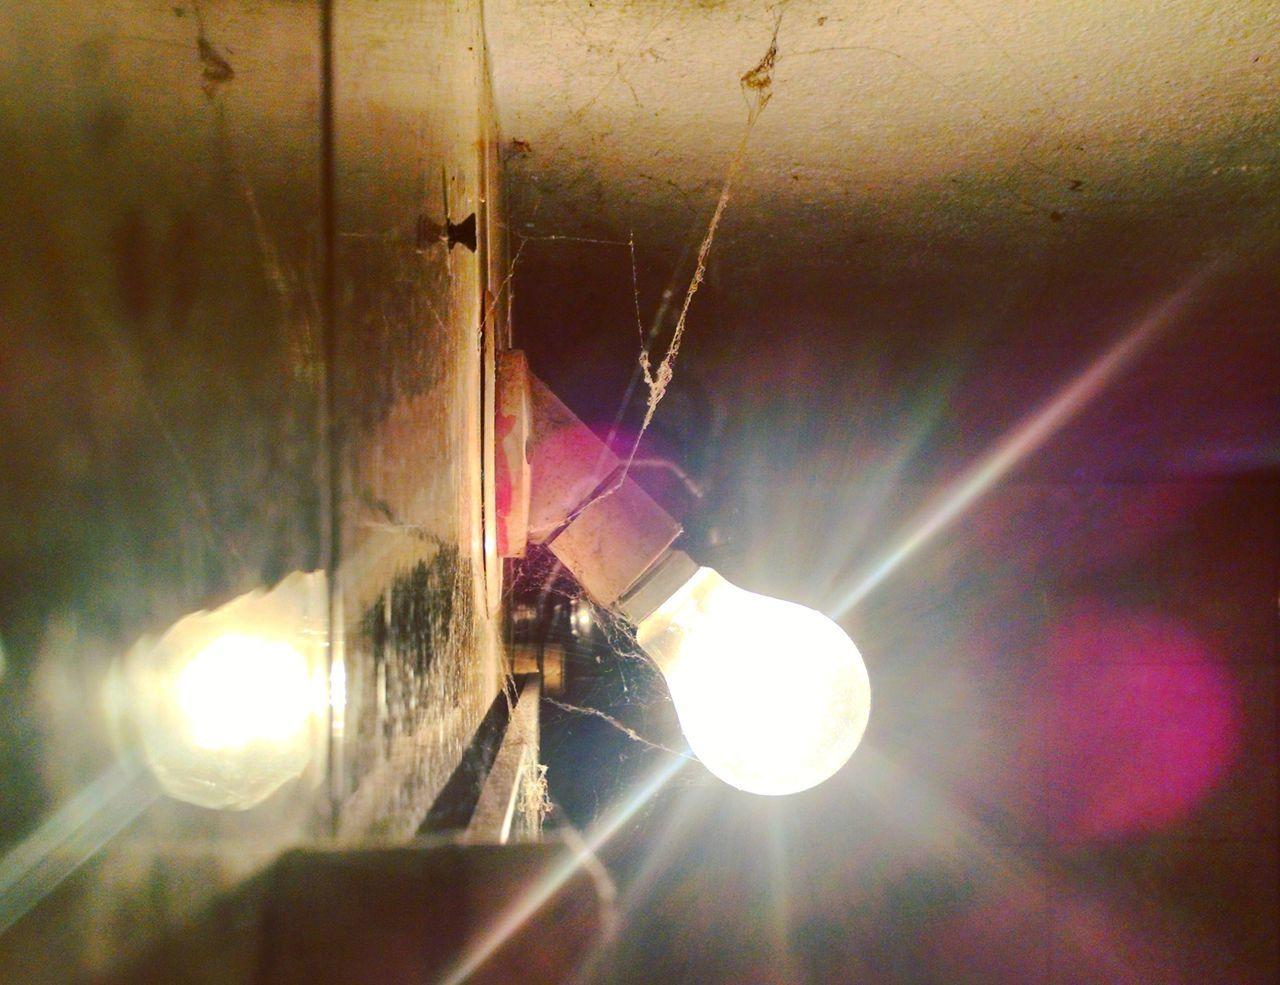 IndoorPhotography Lightporn Bulb Web Spider Spiderweb Tungsten  Bulbphotography EyeEm Gallery Lens Flare Lightrail Lightrays Bathroom